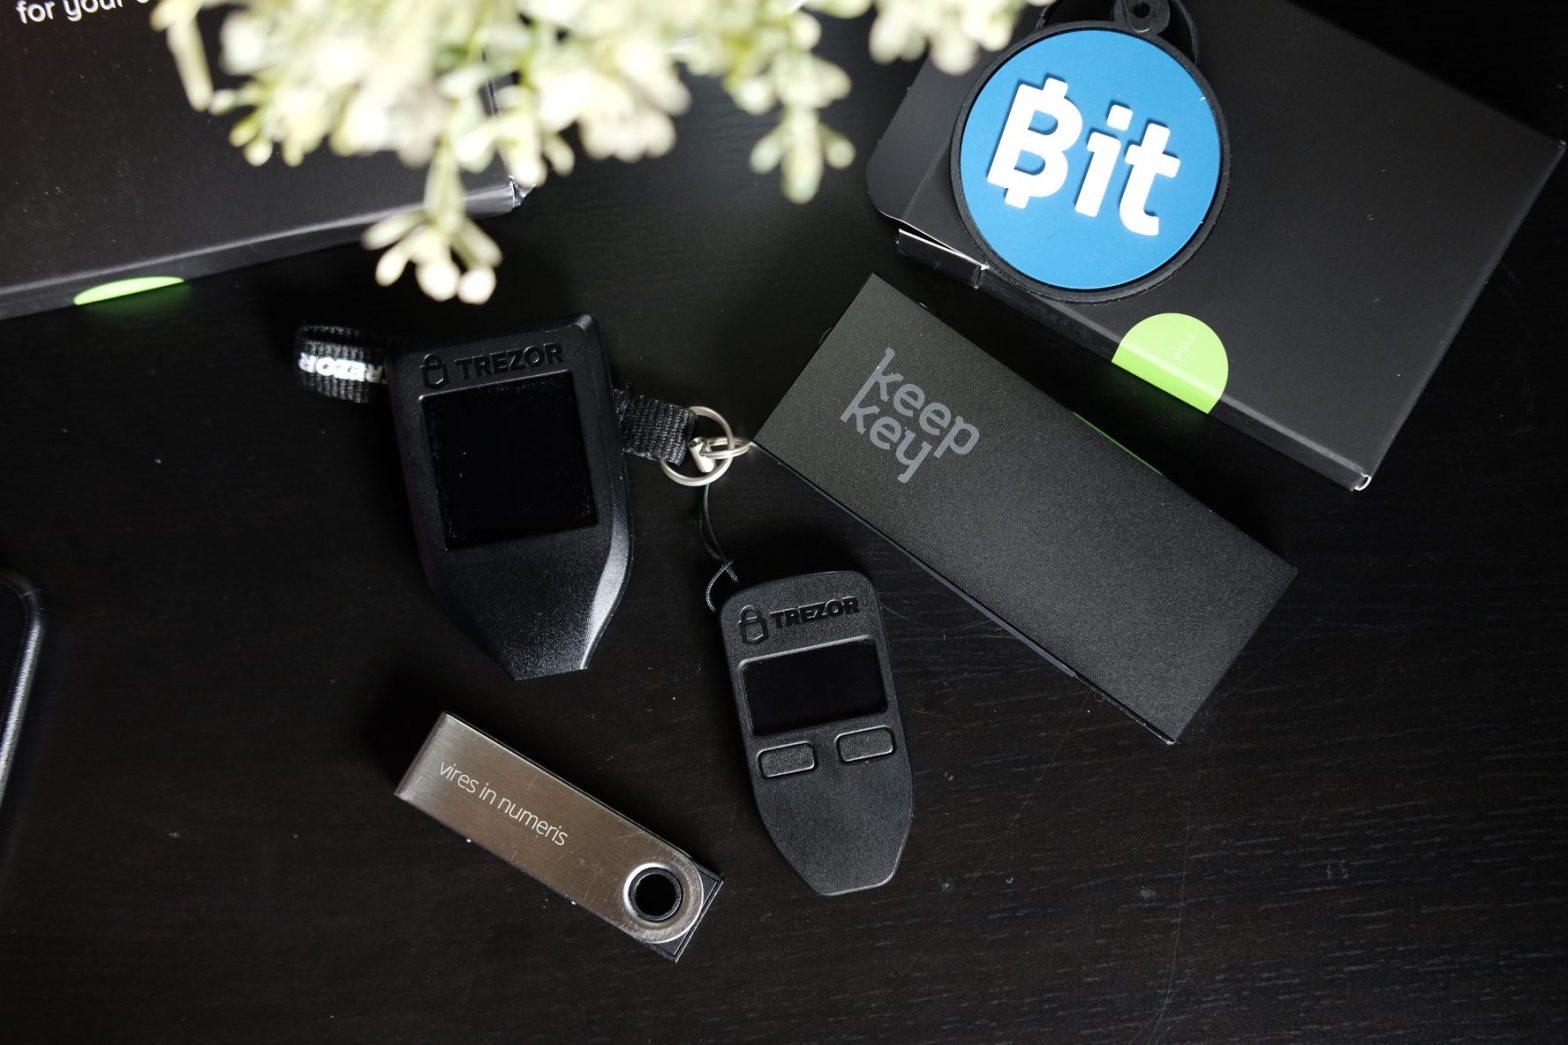 Hardware Wallet กระเป๋าเก็บบิทคอยน์